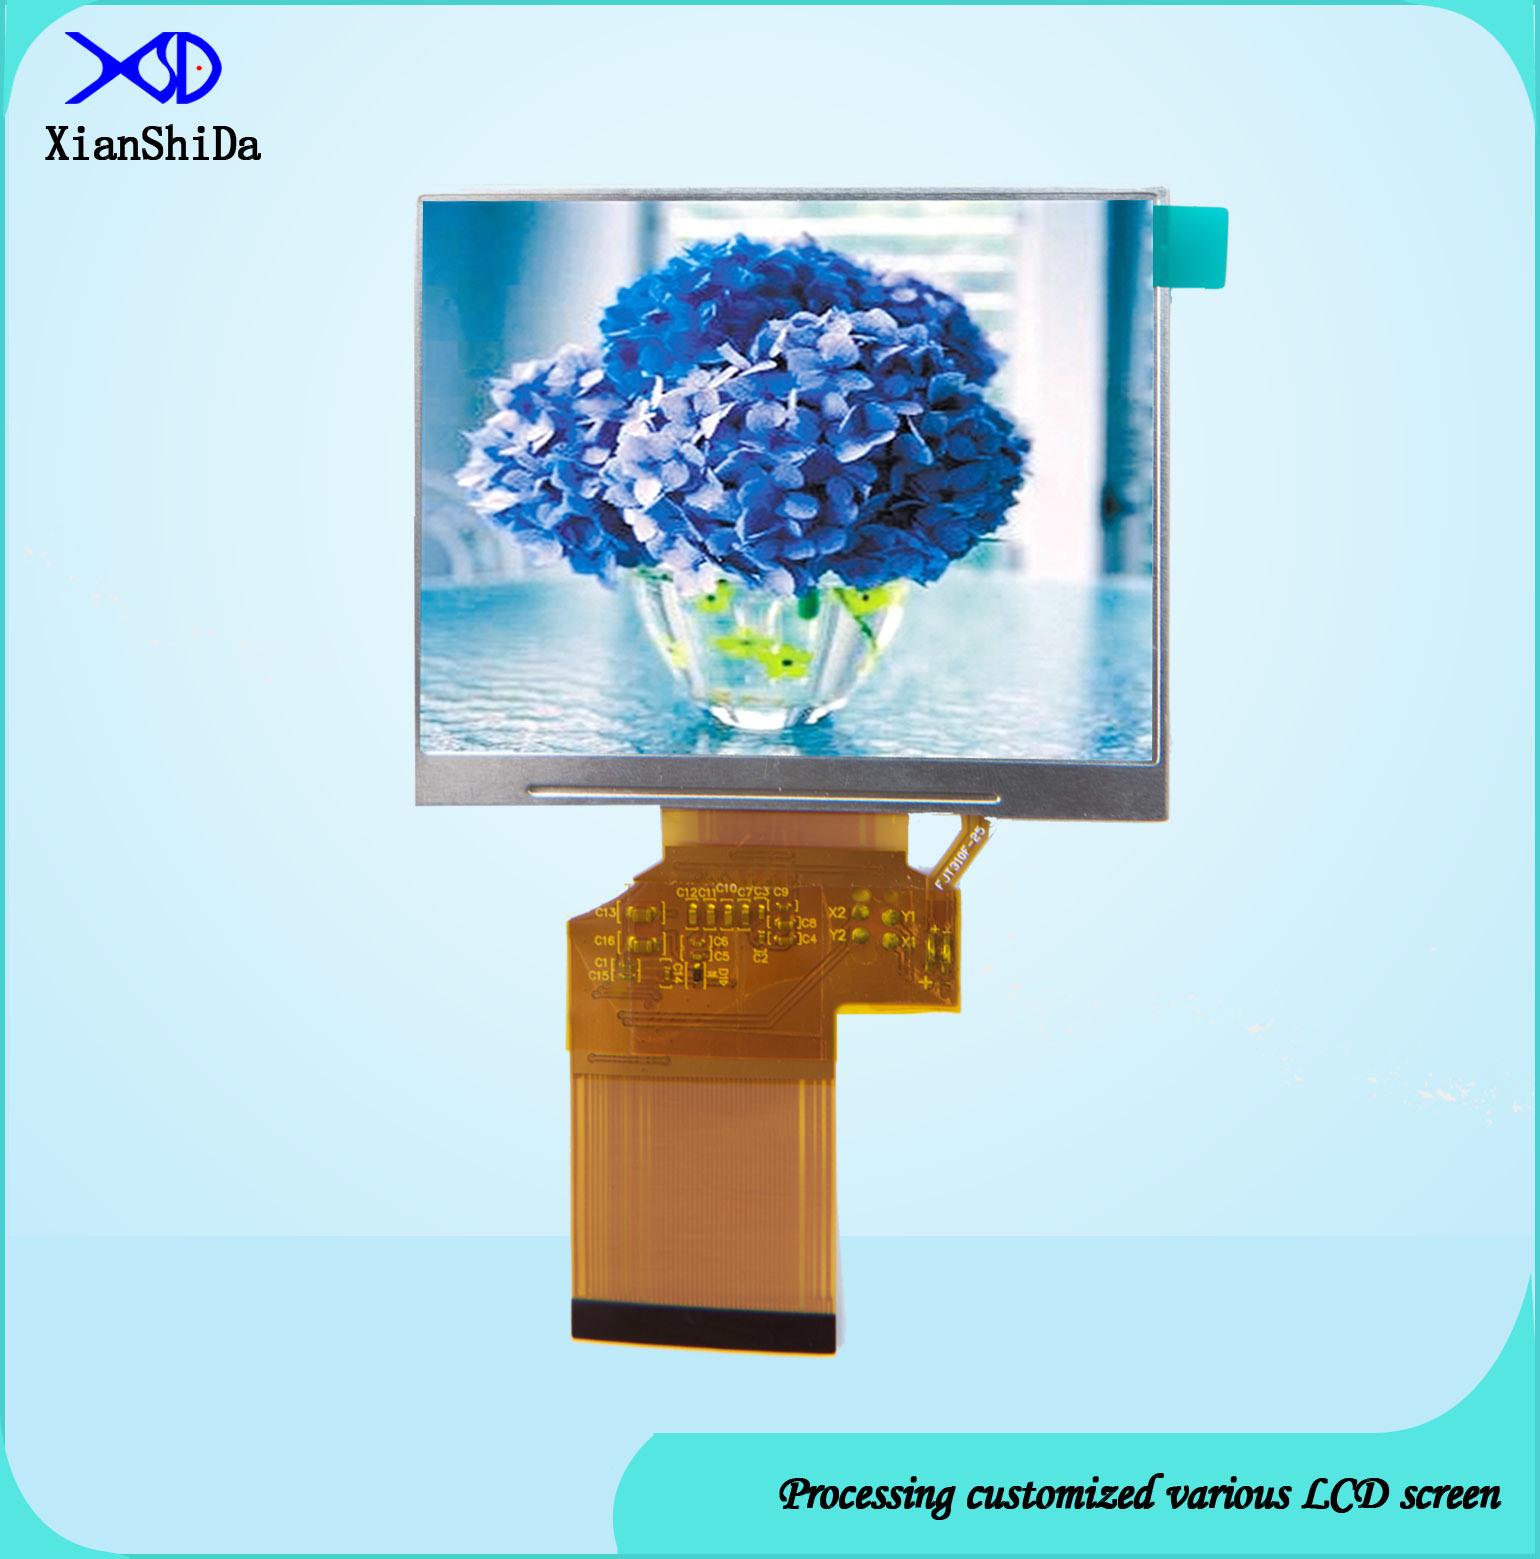 3.5 Inch LCD Screen 780CD/M2 High Luminance TFT LCD Display Module with 24 Bit RGB Interface